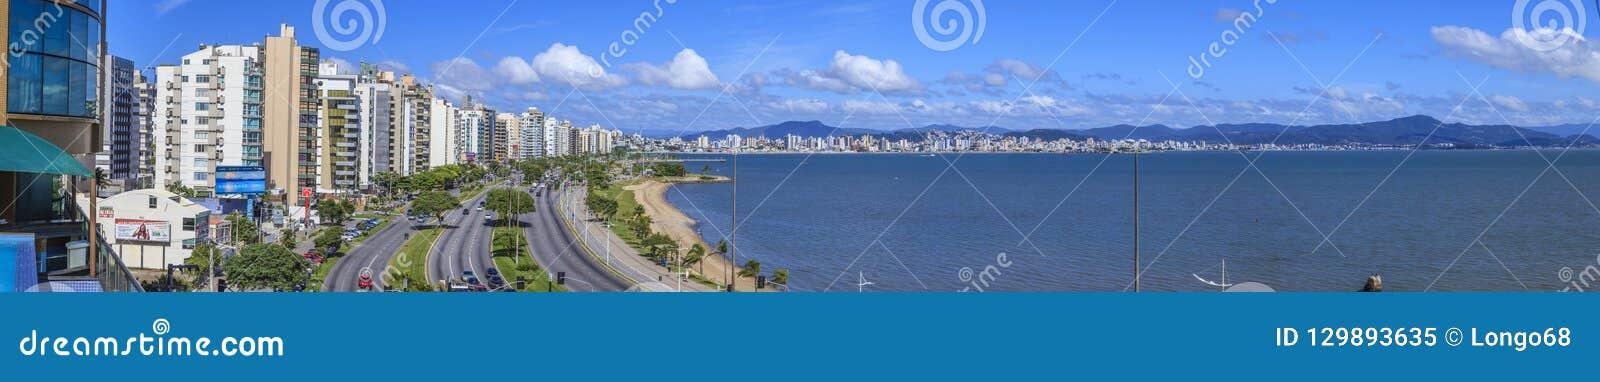 Panoramic picture of the promenade in Florianopolis